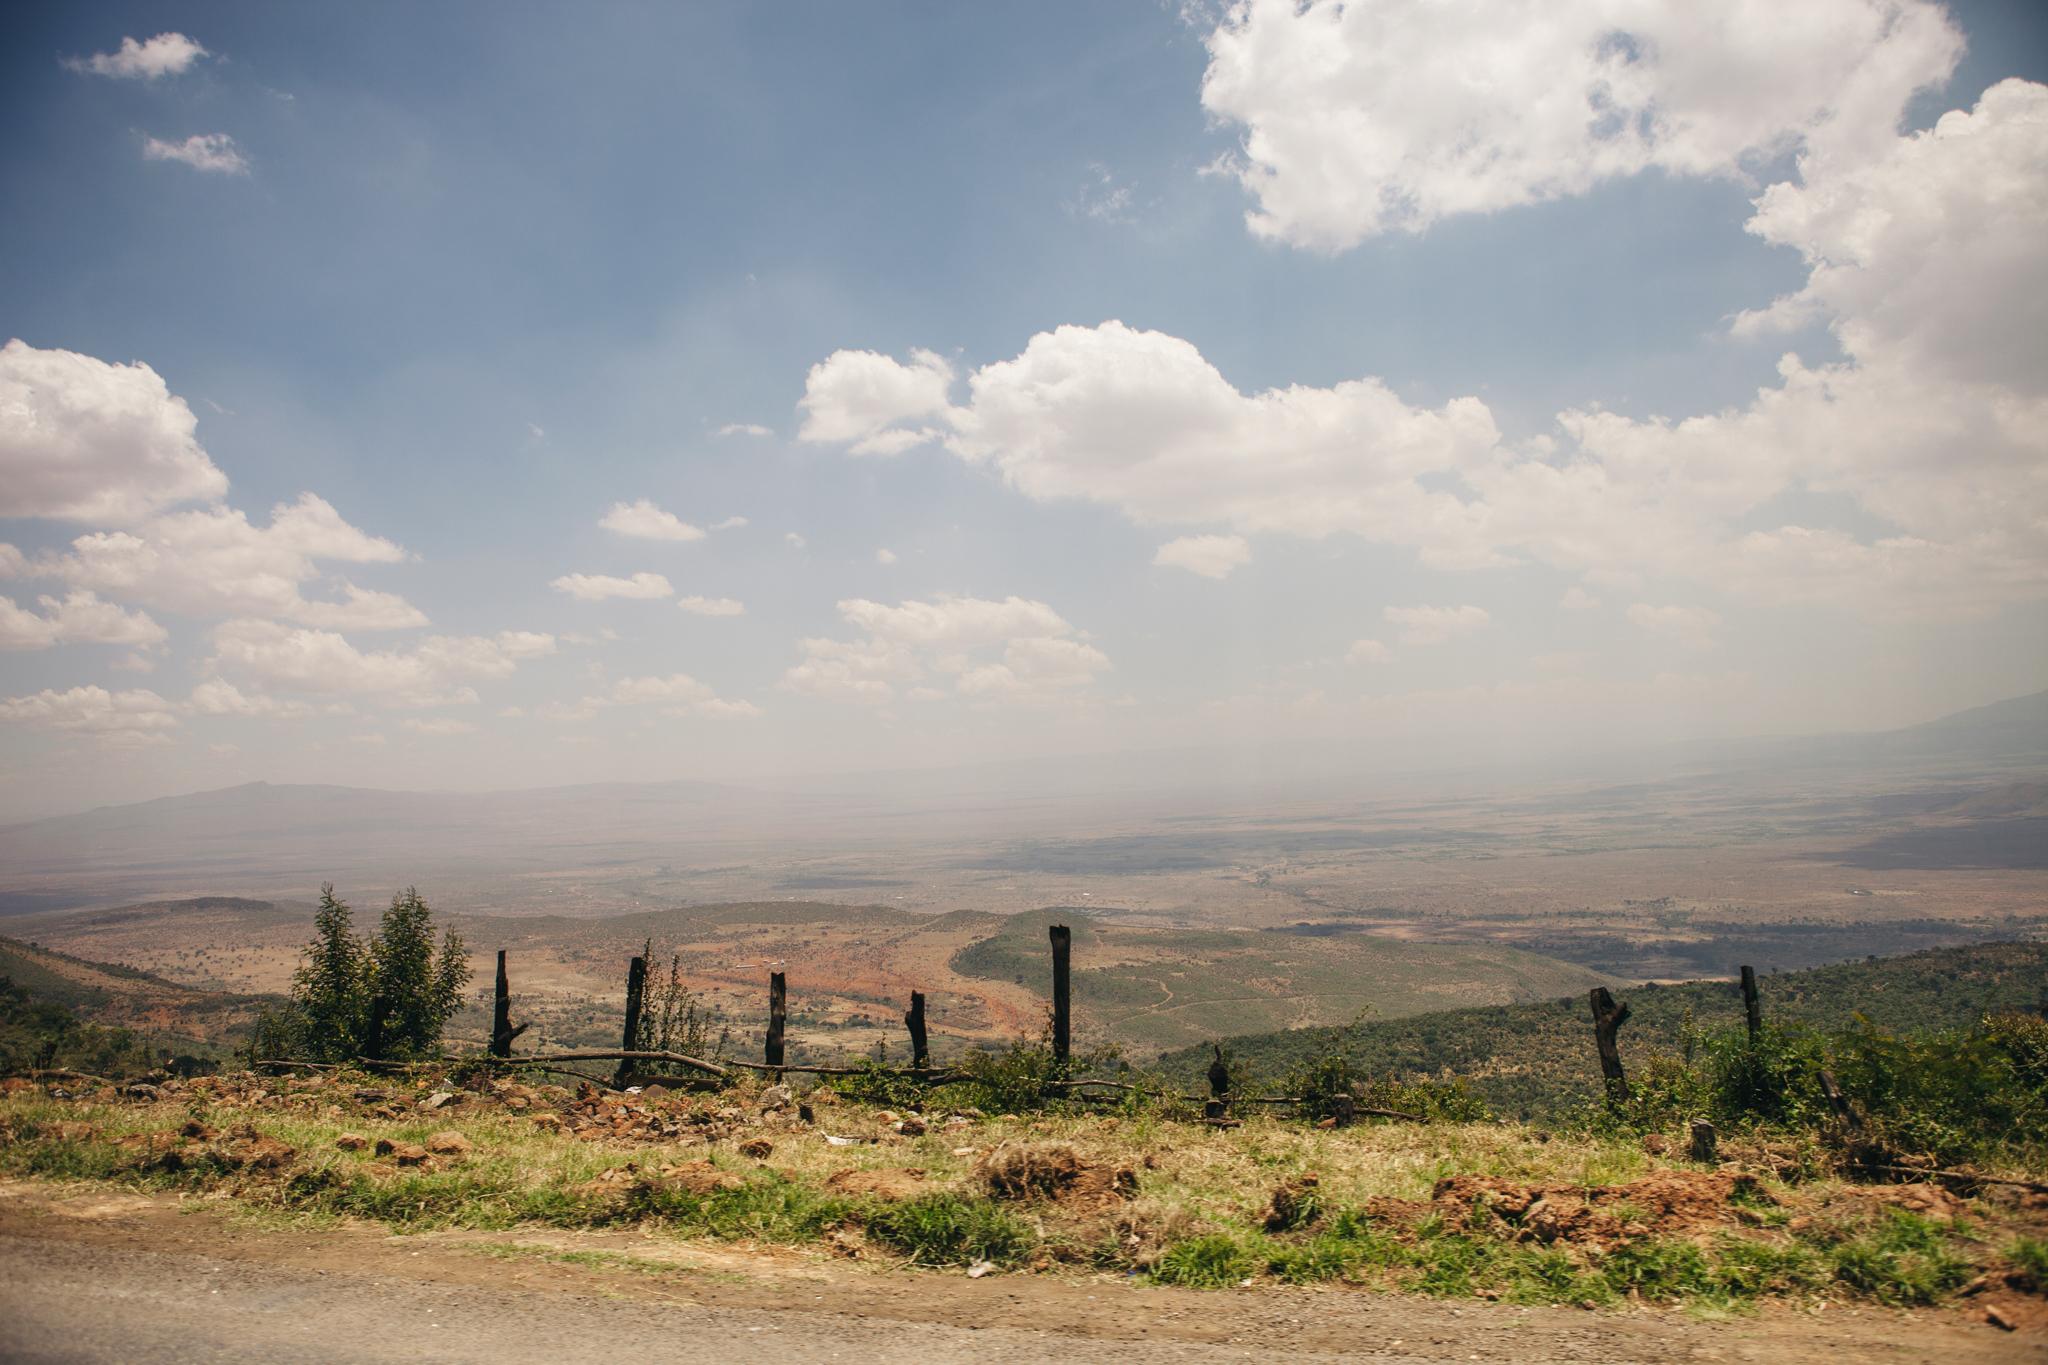 Kenya-165.jpg